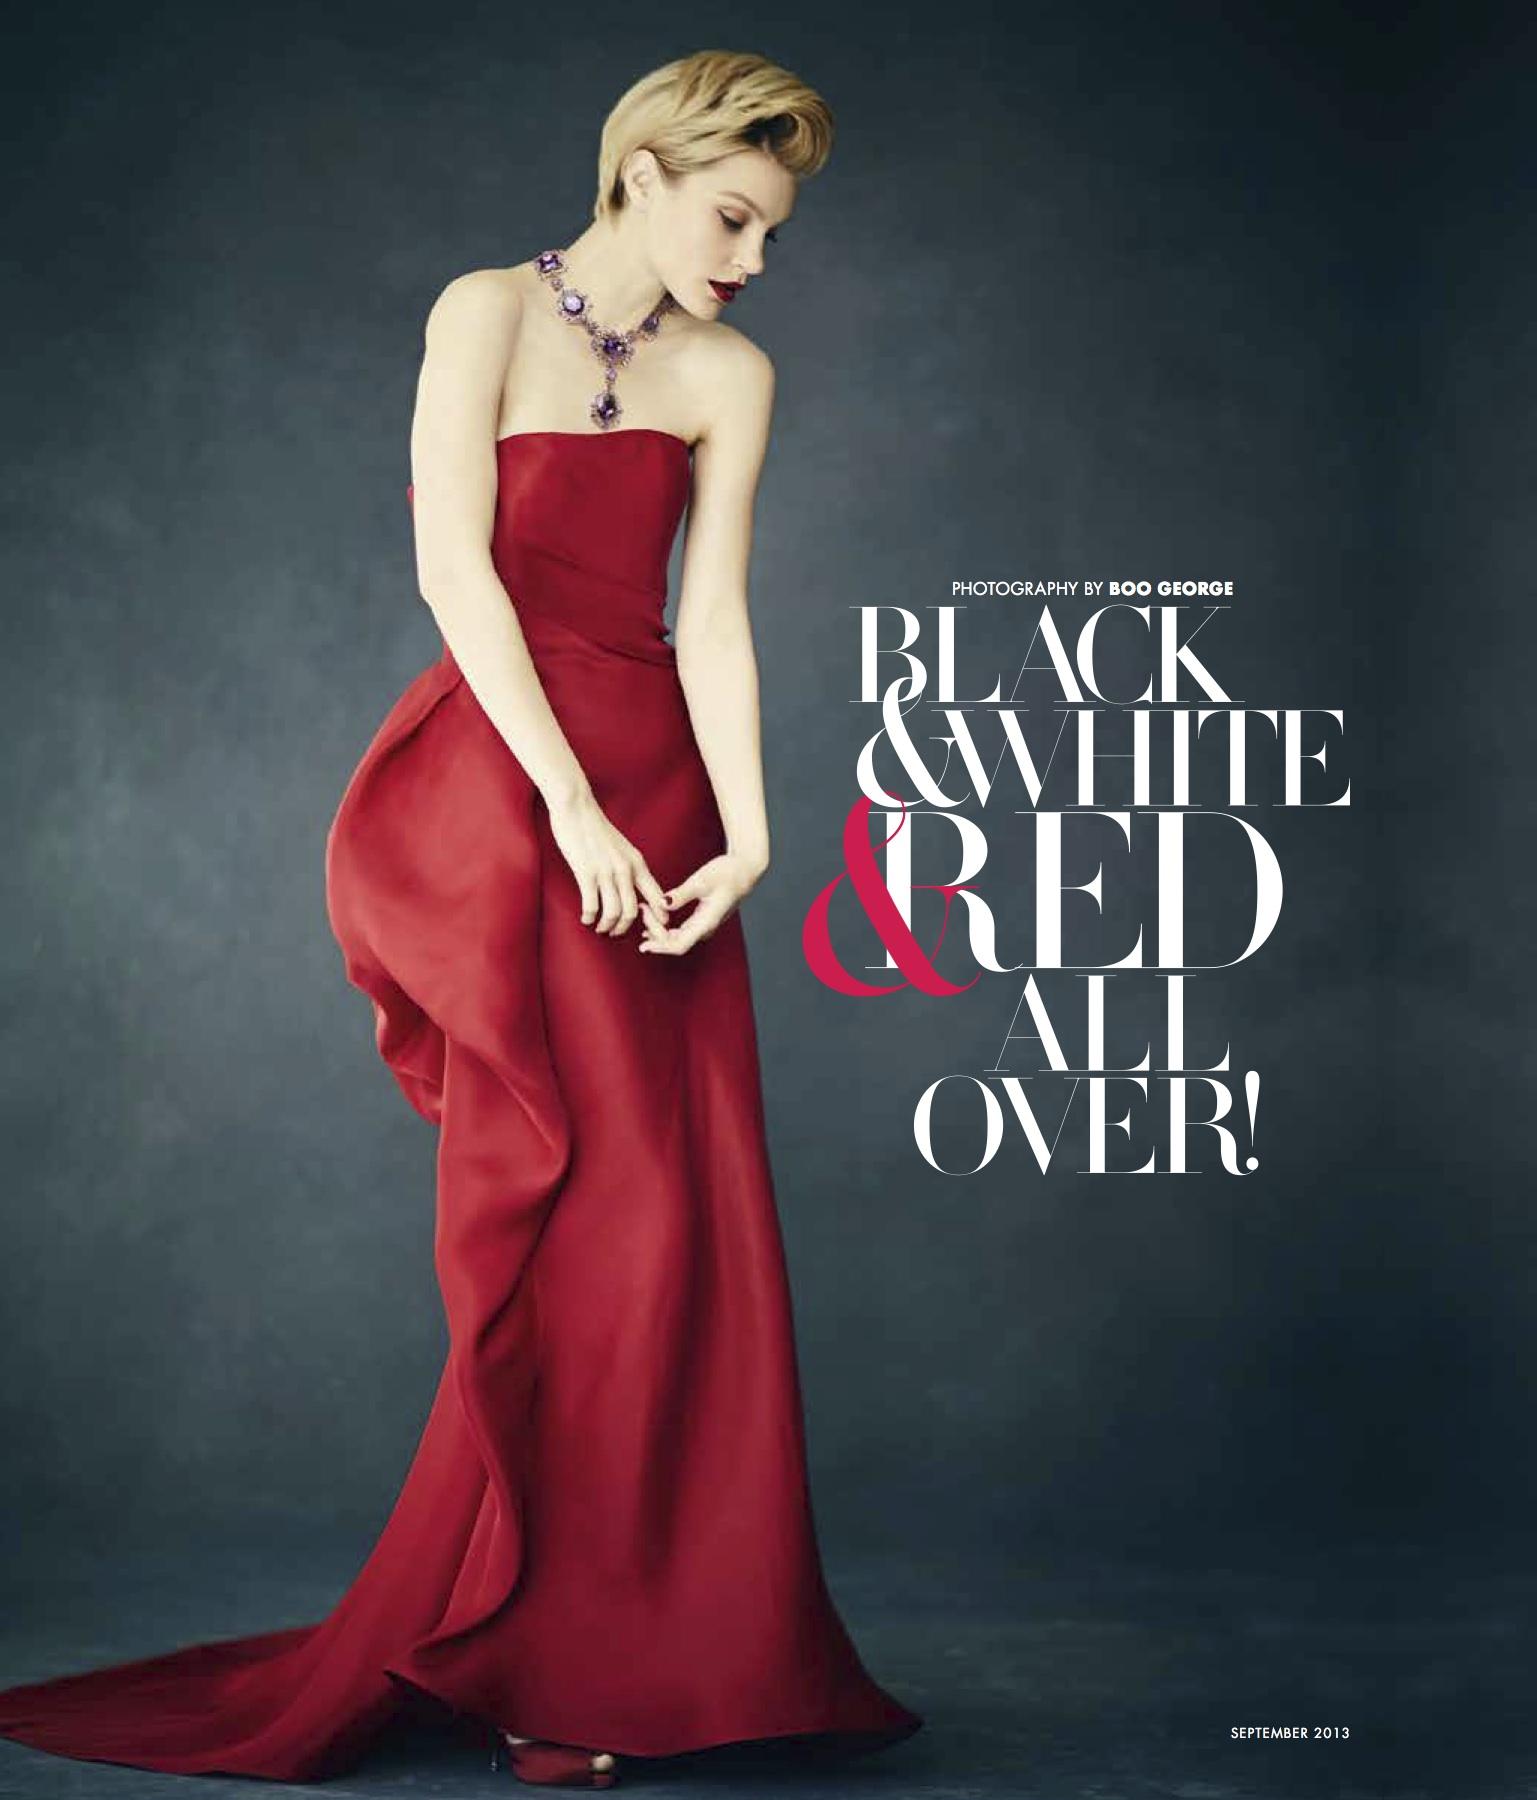 The book by neiman marcus rubin singer blog couture for The book neiman marcus